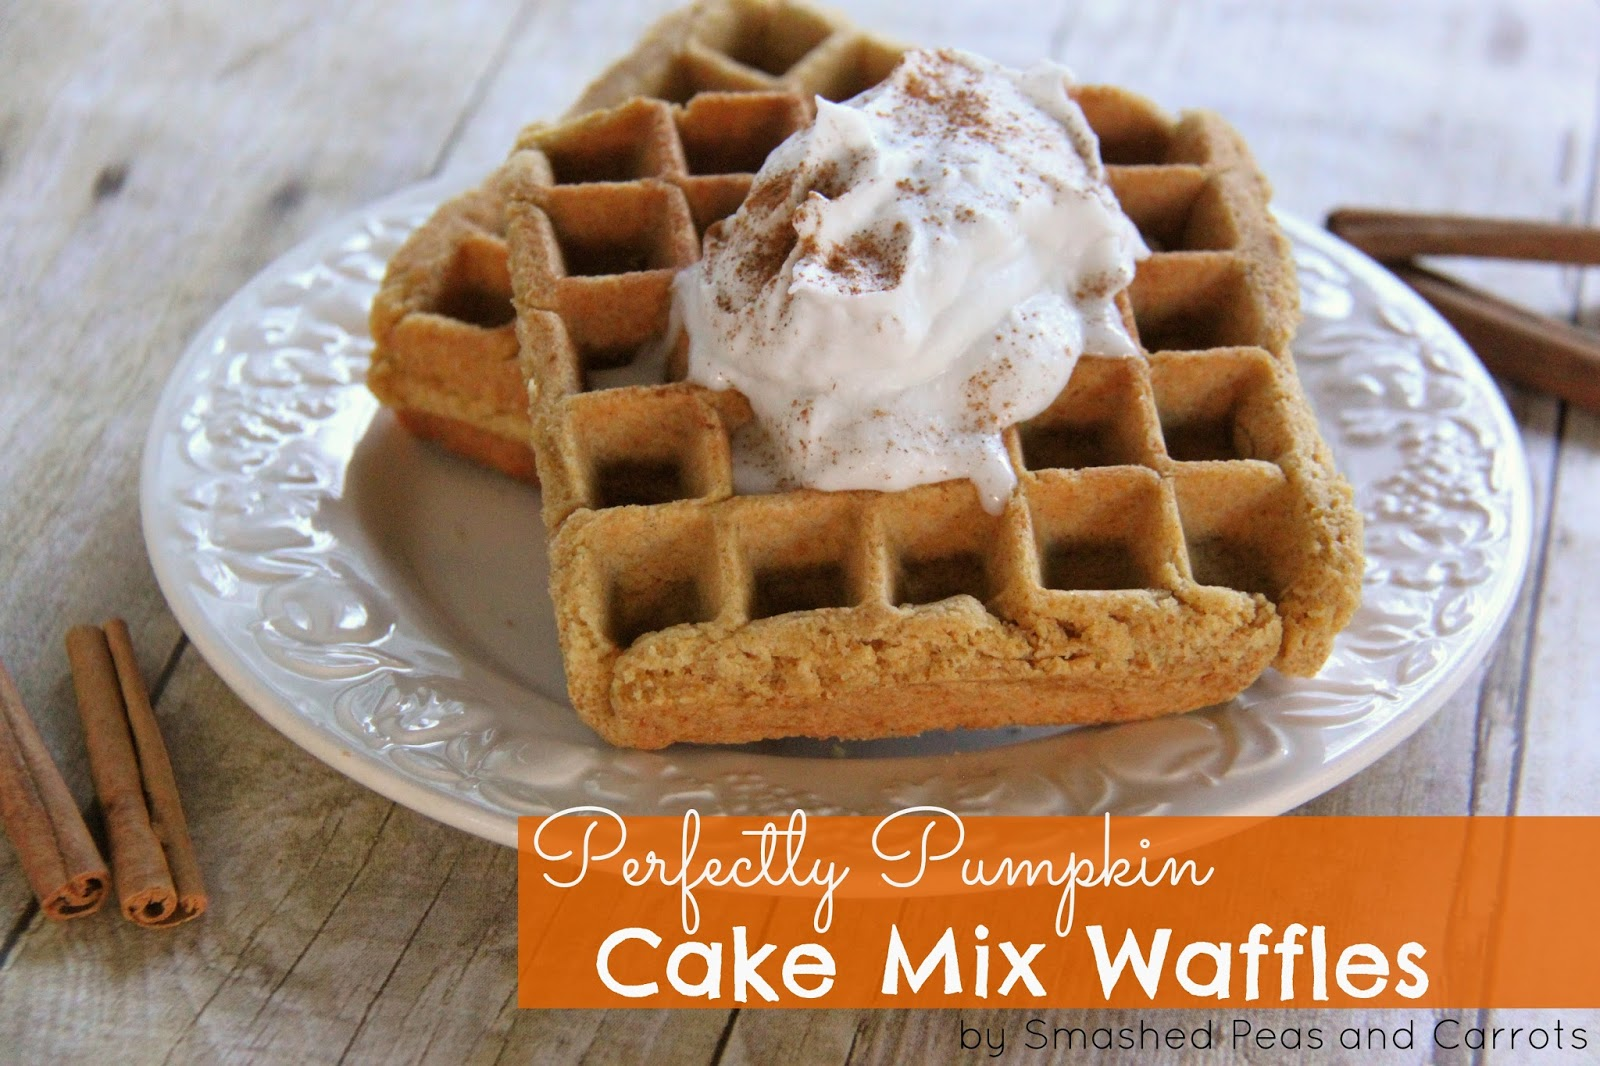 Sand Art Cake Mix : RECIPE: Perfectly Pumpkin Cake Mix Waffles - Smashed Peas ...